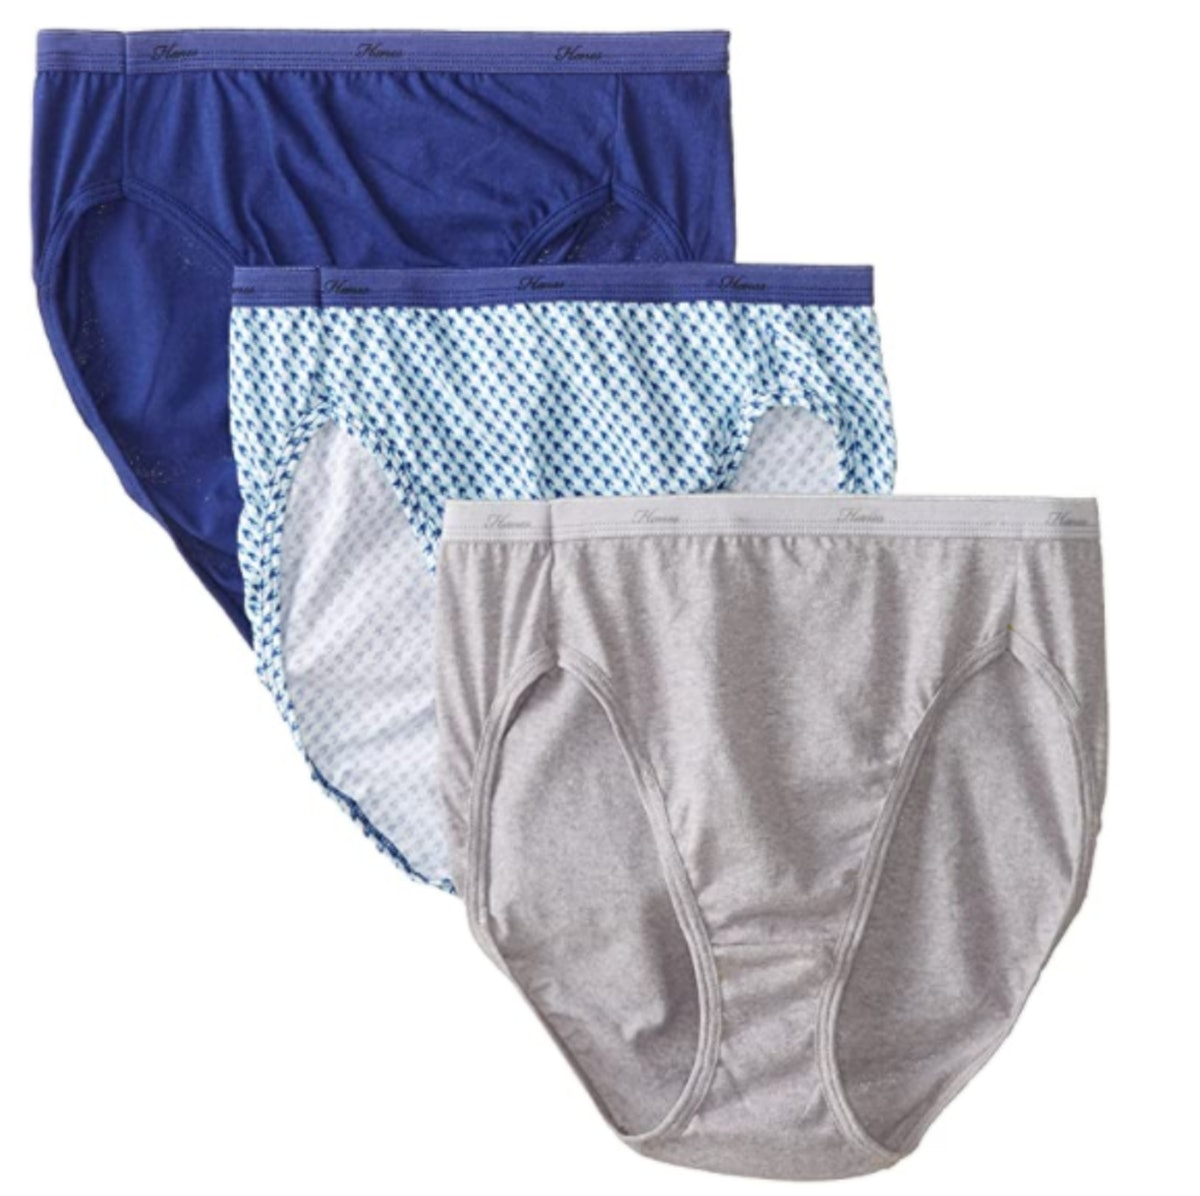 Hanes Cotton Hi Cut Panty Multipack (3-Pack)